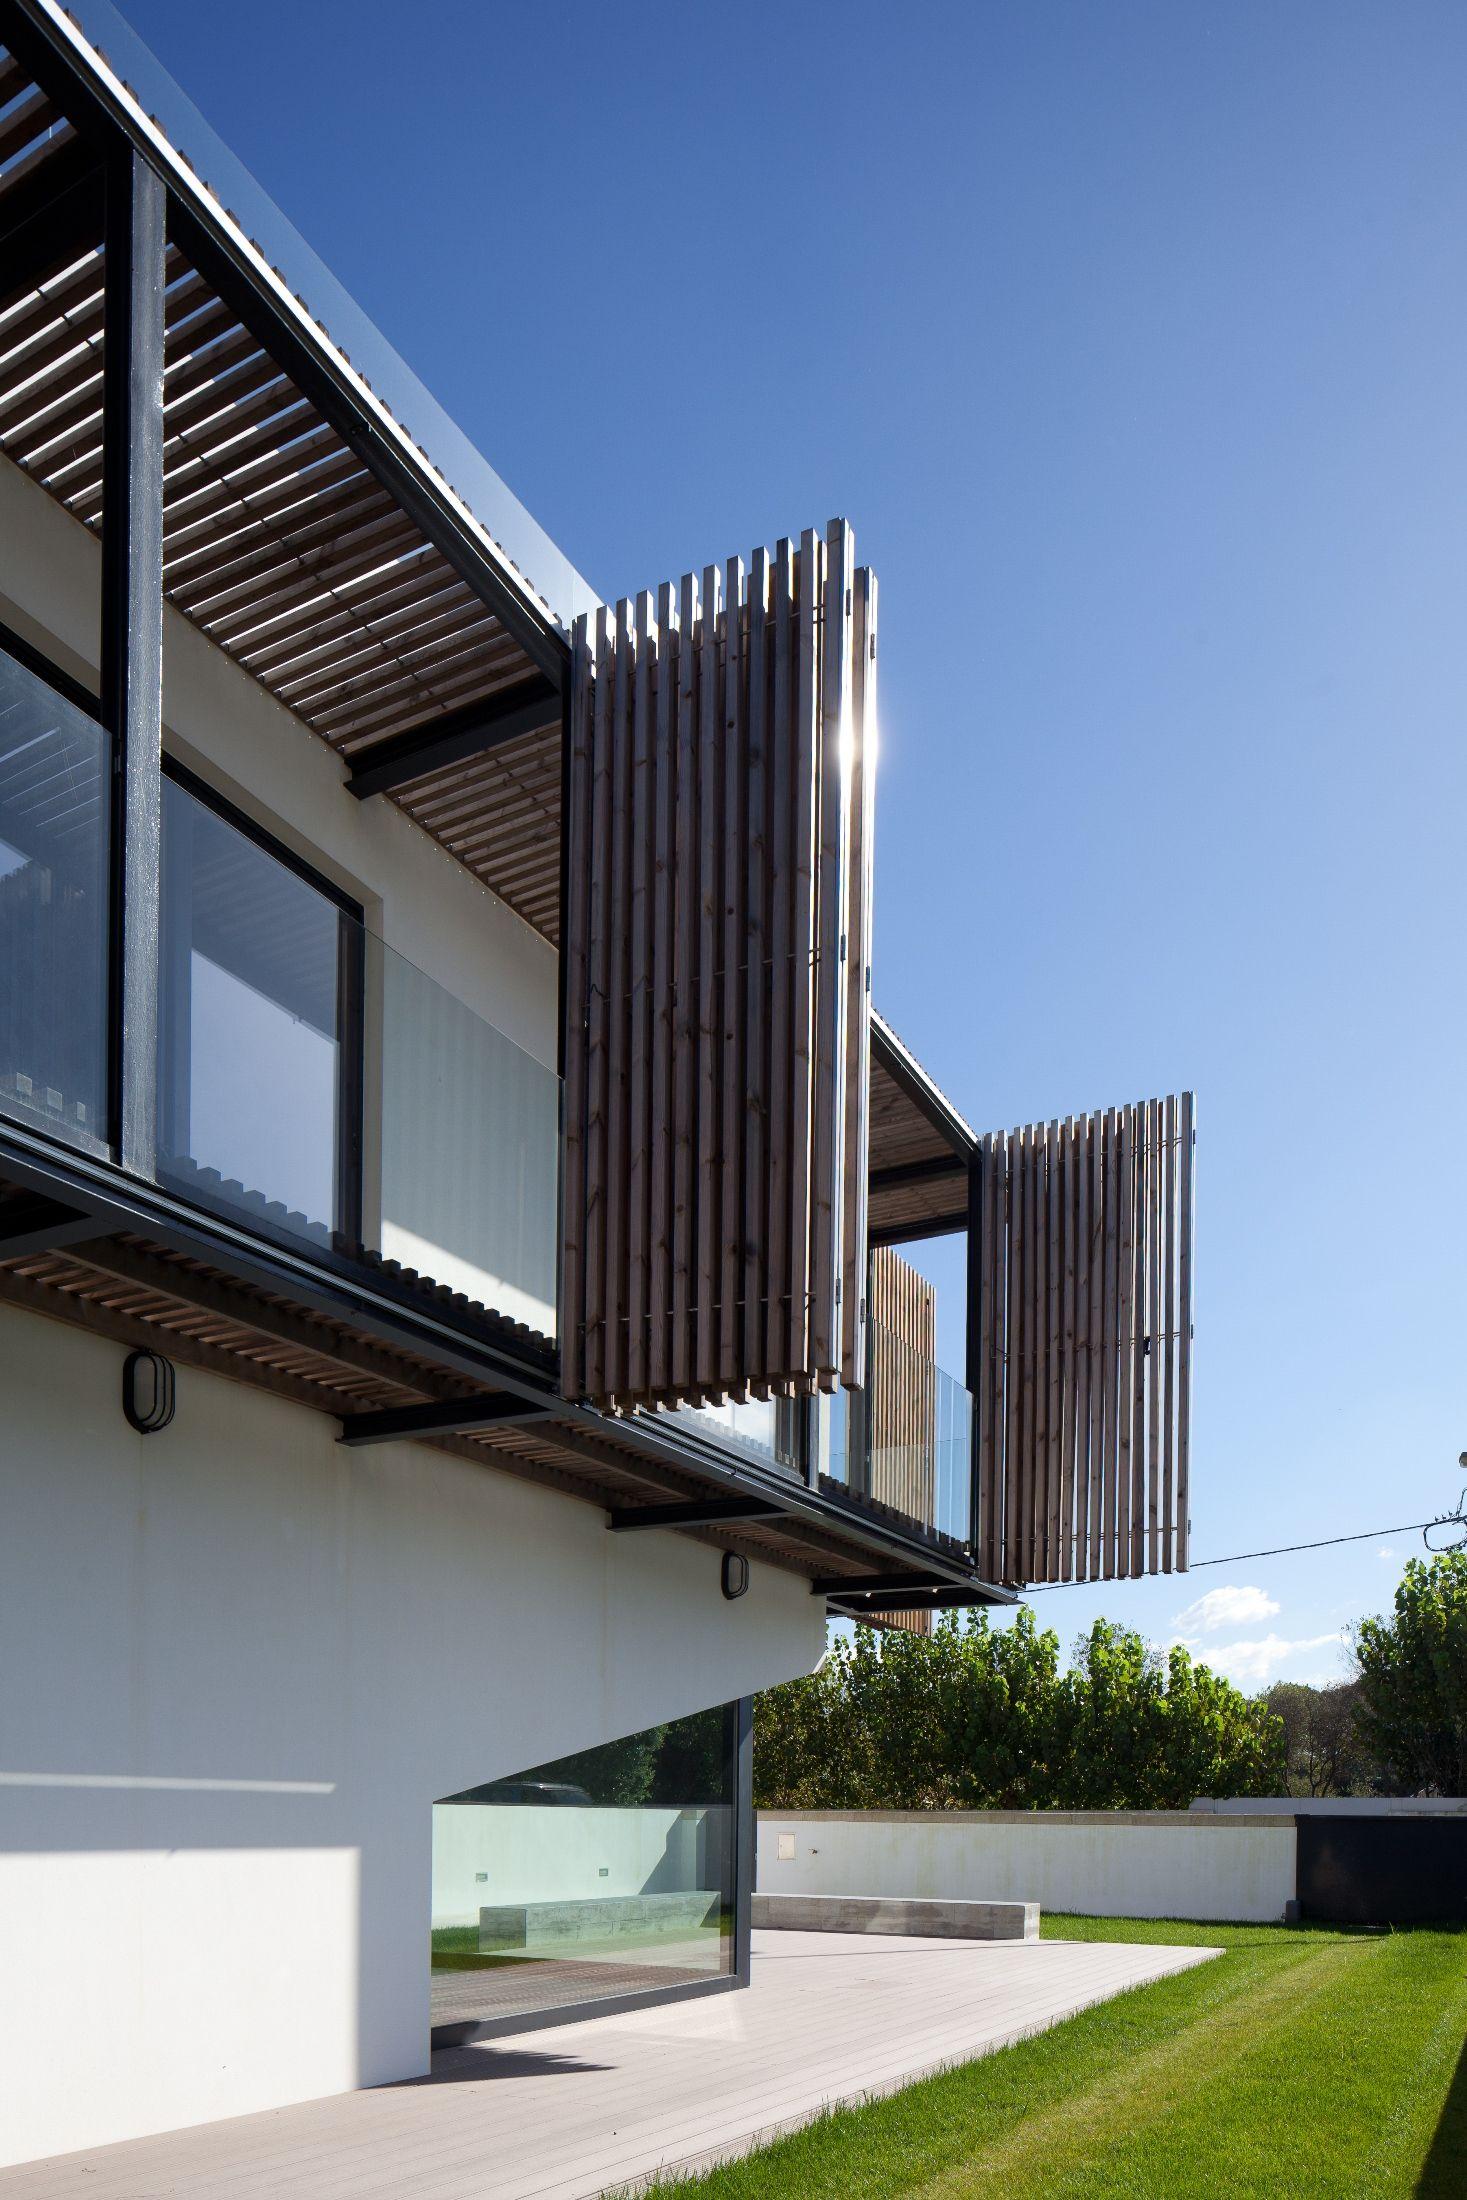 Brise soleil manufacturer of architecture facade systems ...   Brise Soleil